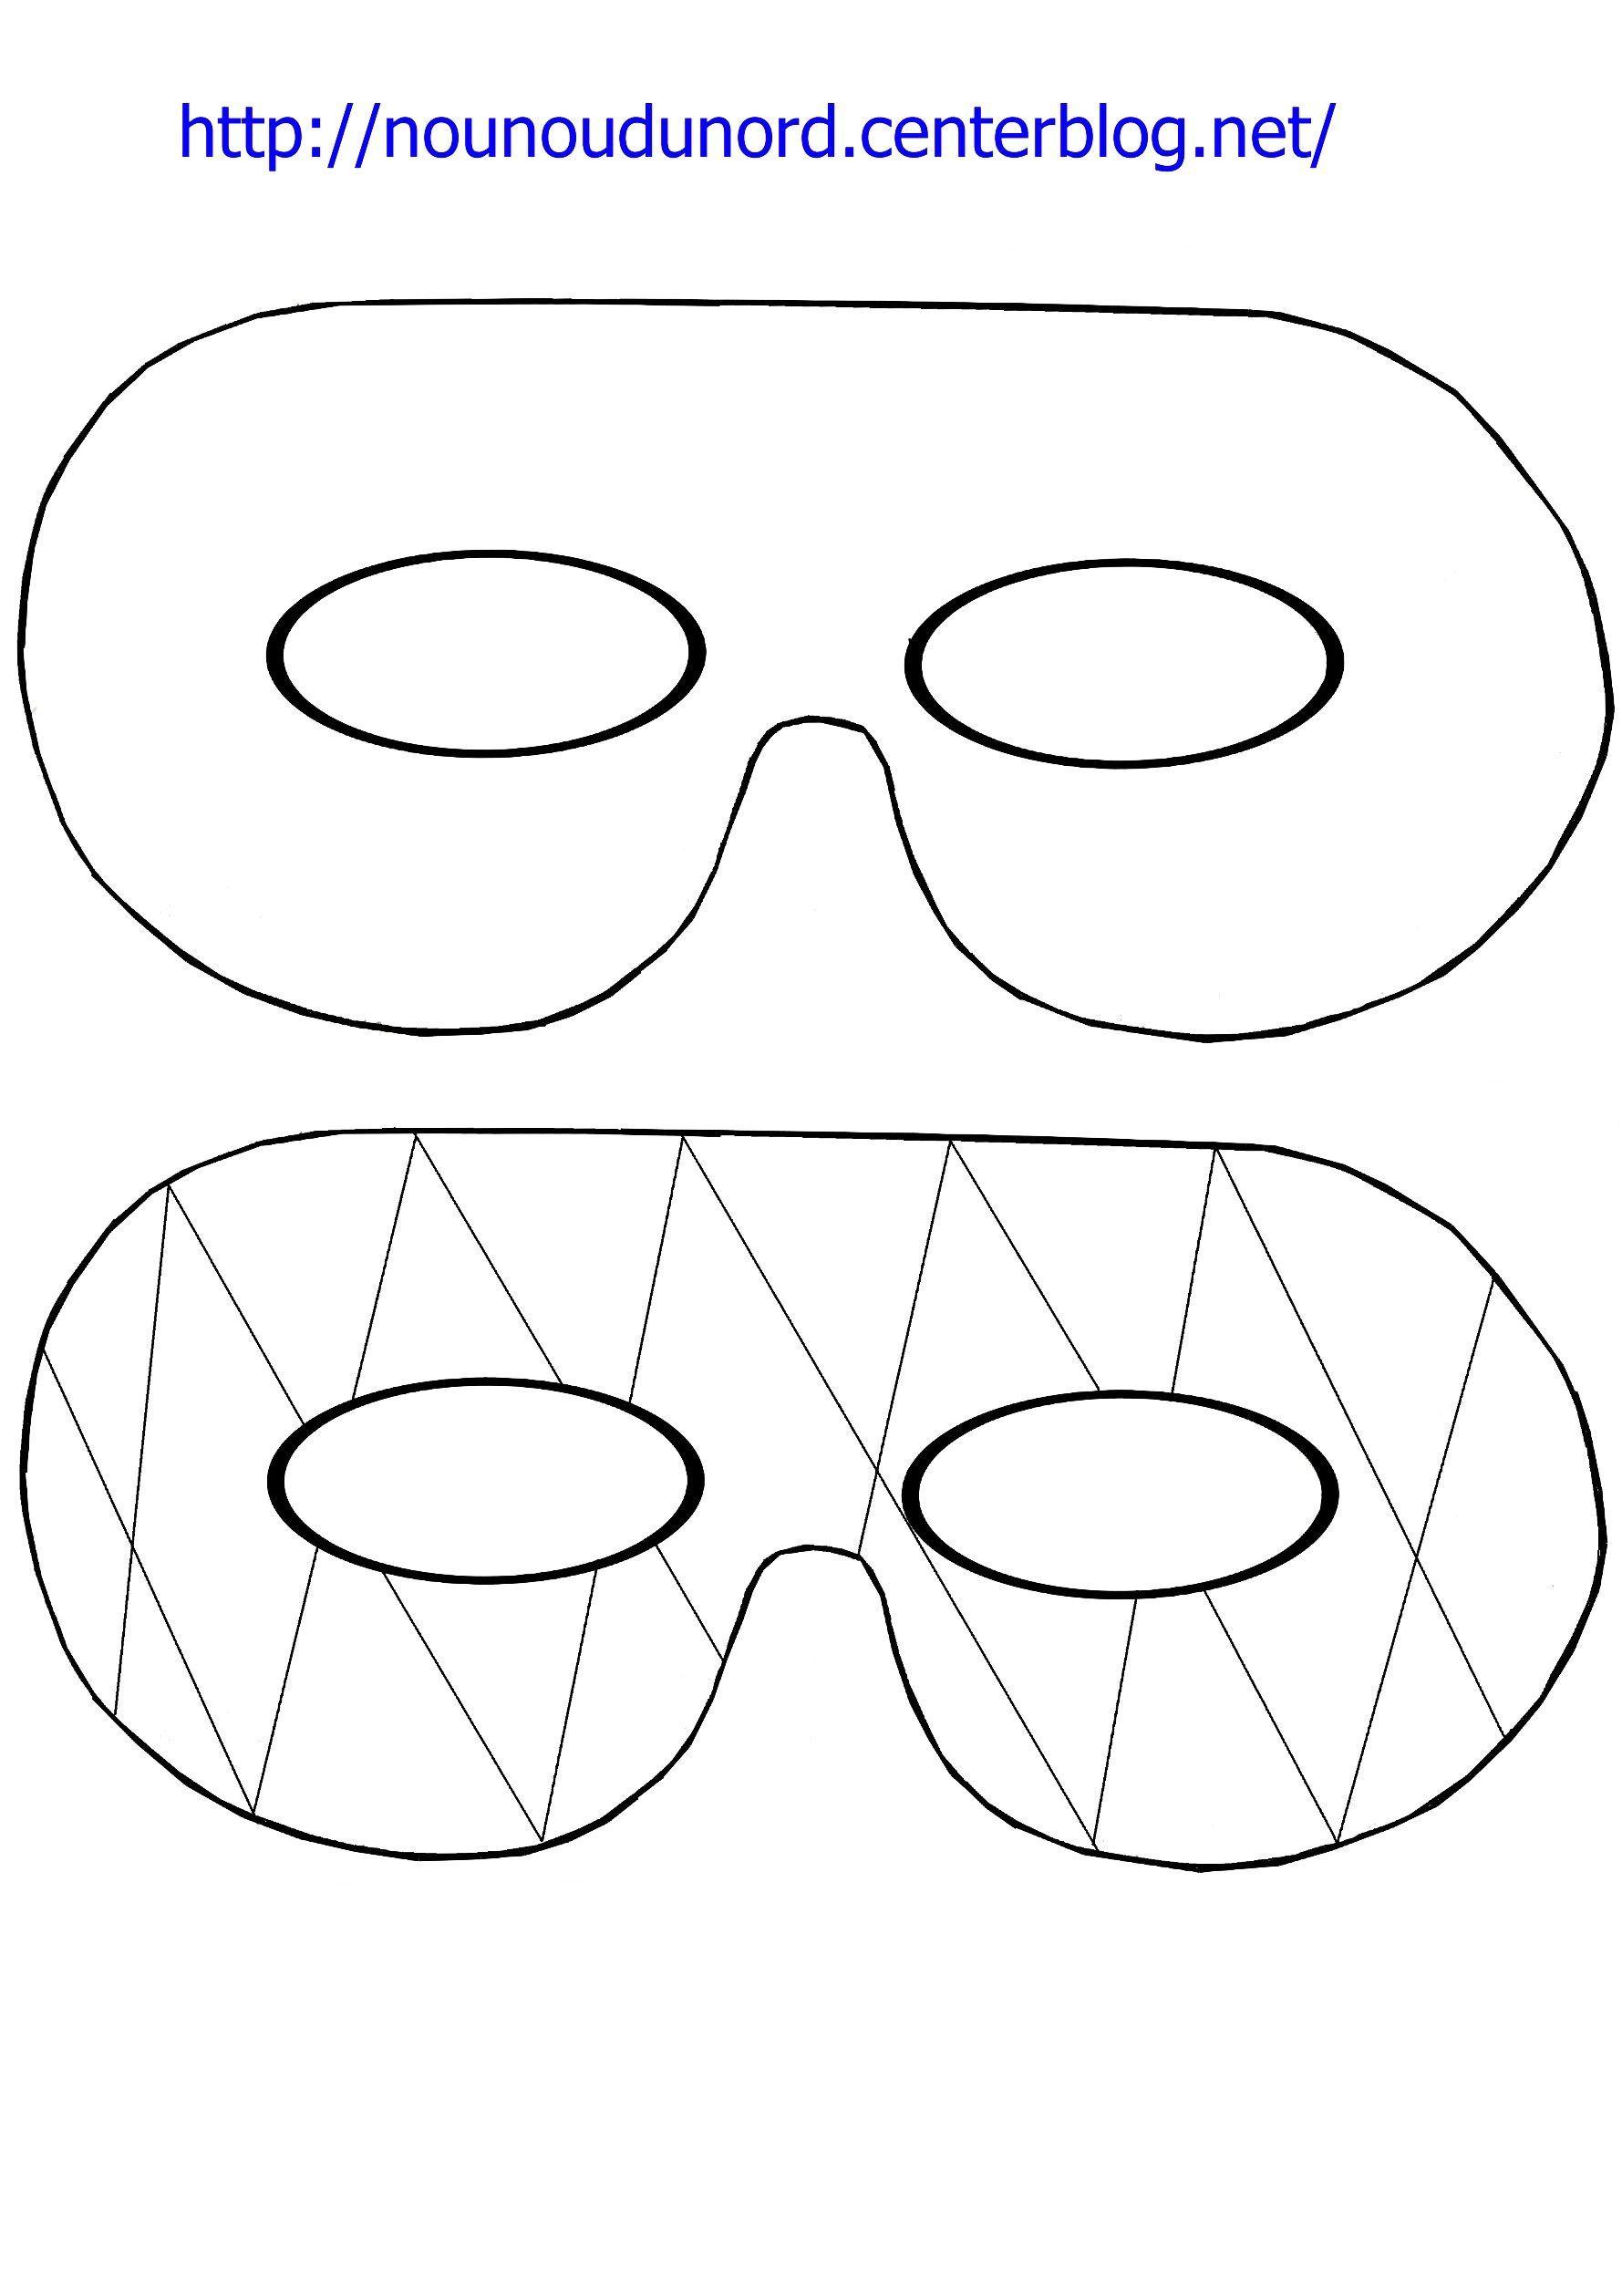 Masque Simple Et Arlequin À Imprimer dedans Modele Masque De Carnaval A Imprimer